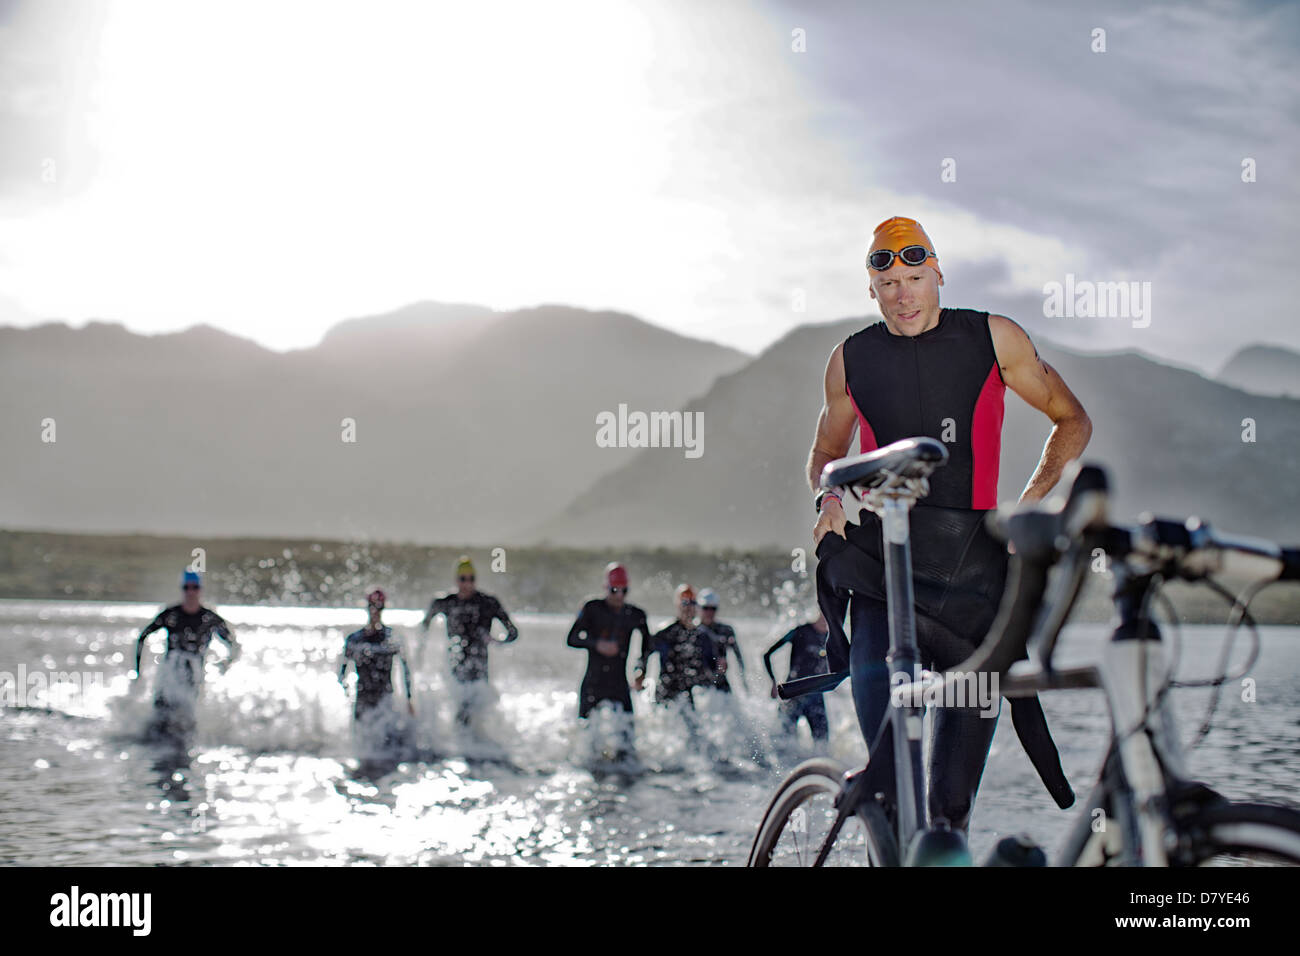 Triathleten aus Wasser Stockbild